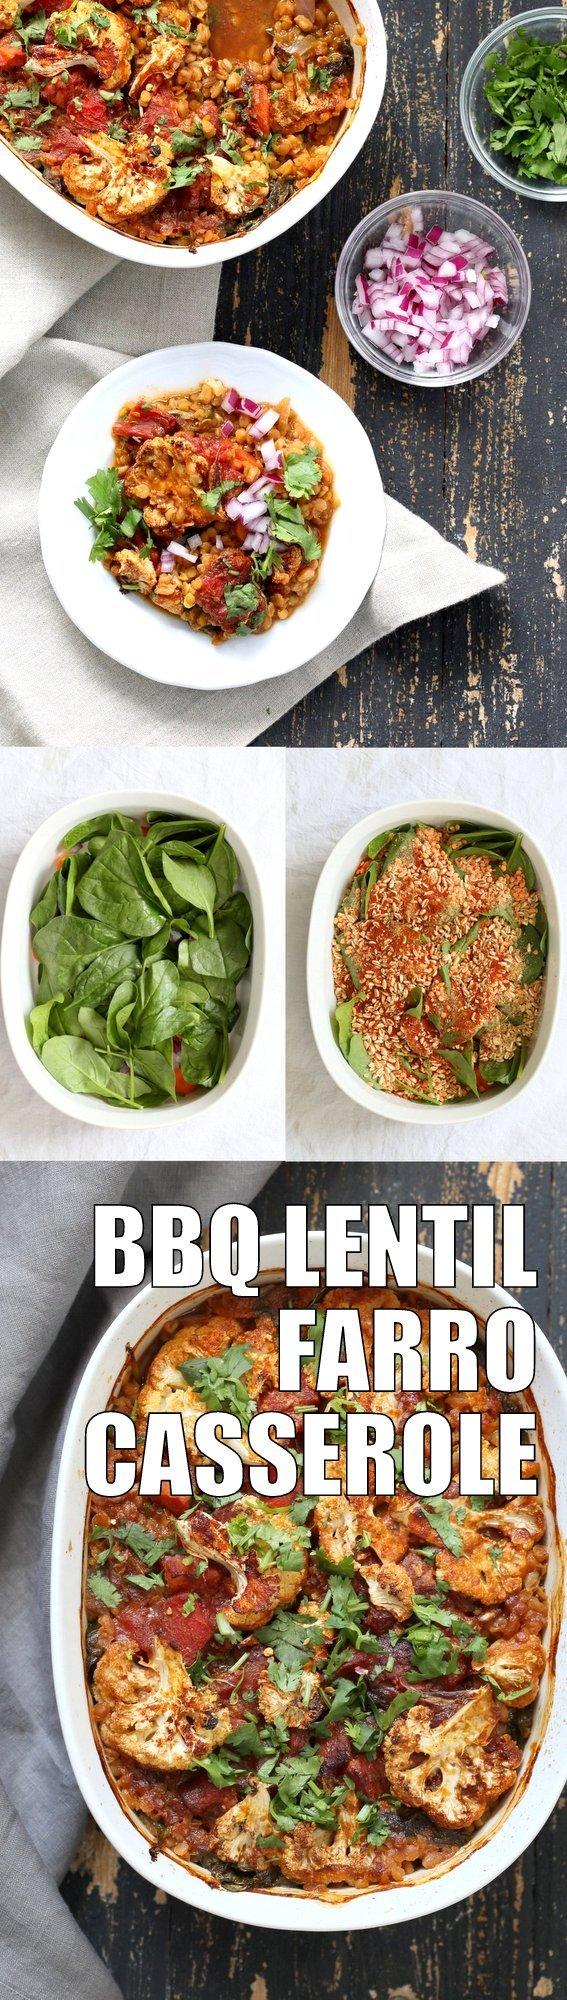 BBQ Lentil Farro Cauliflower Casserole. BBQ Casserole with Red Lentils, Farro, Veggies, Spinach, Cauliflower all layered and baked. Amazing Flavors! #Vegan #Glutenfree #Nutfree #Recipe. Can be soyfree #veganricha | VeganRicha.com